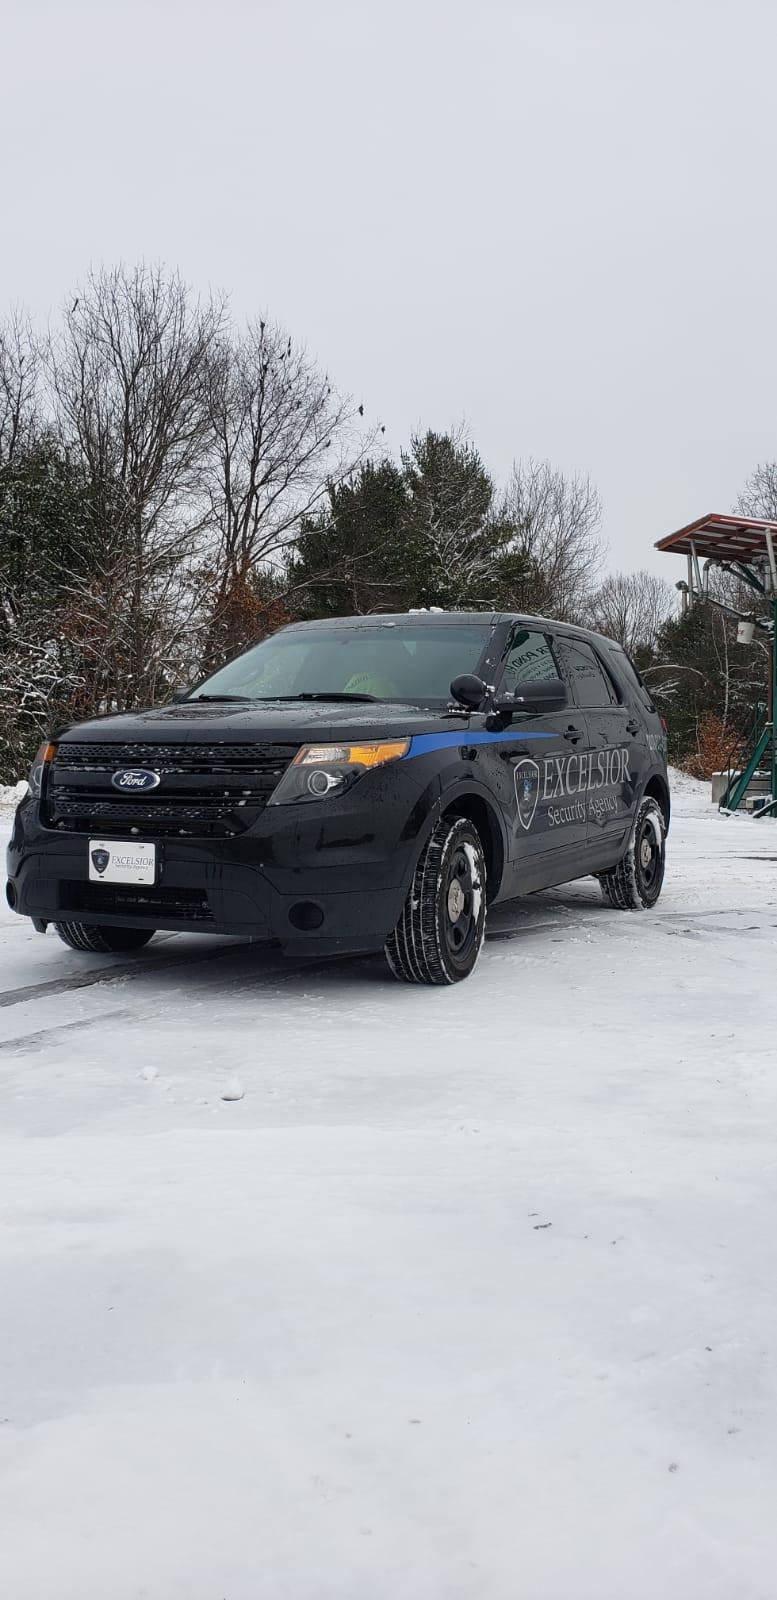 Maine Explorer - Winter Conditions